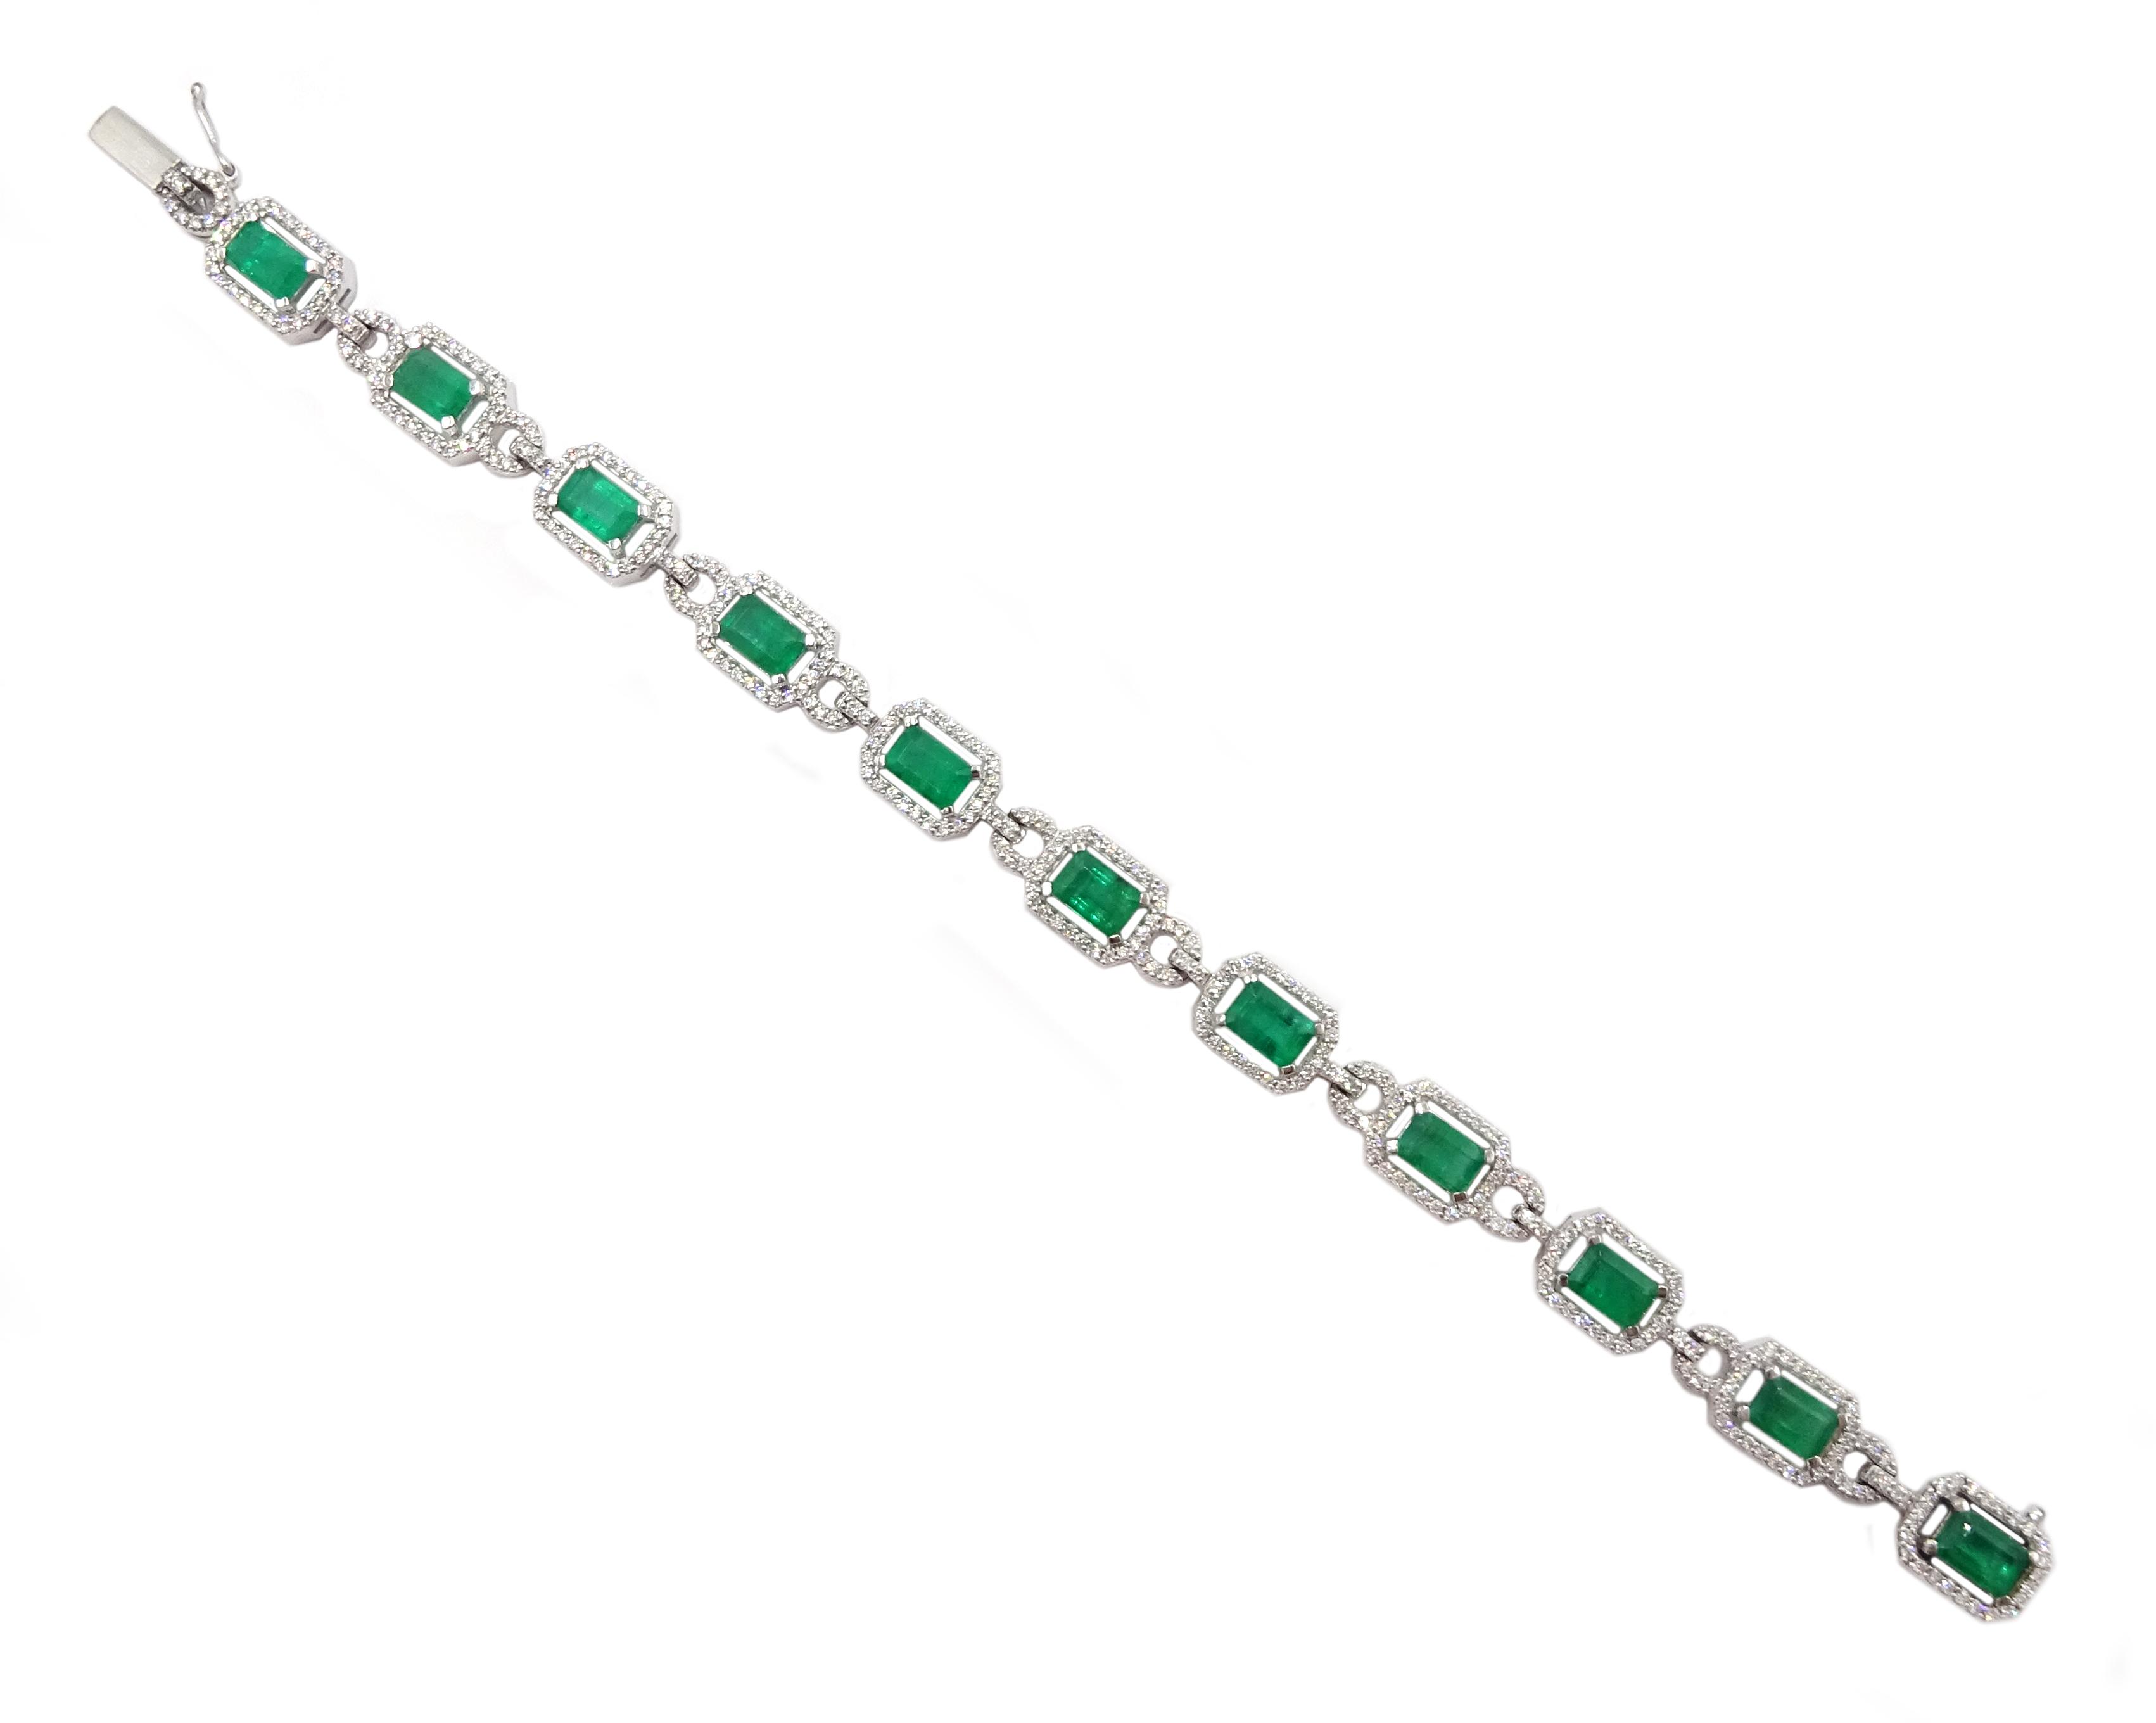 18ct white gold emerald cut emerald and round brilliant cut diamond bracelet, hallmarked, emerald - Image 2 of 4